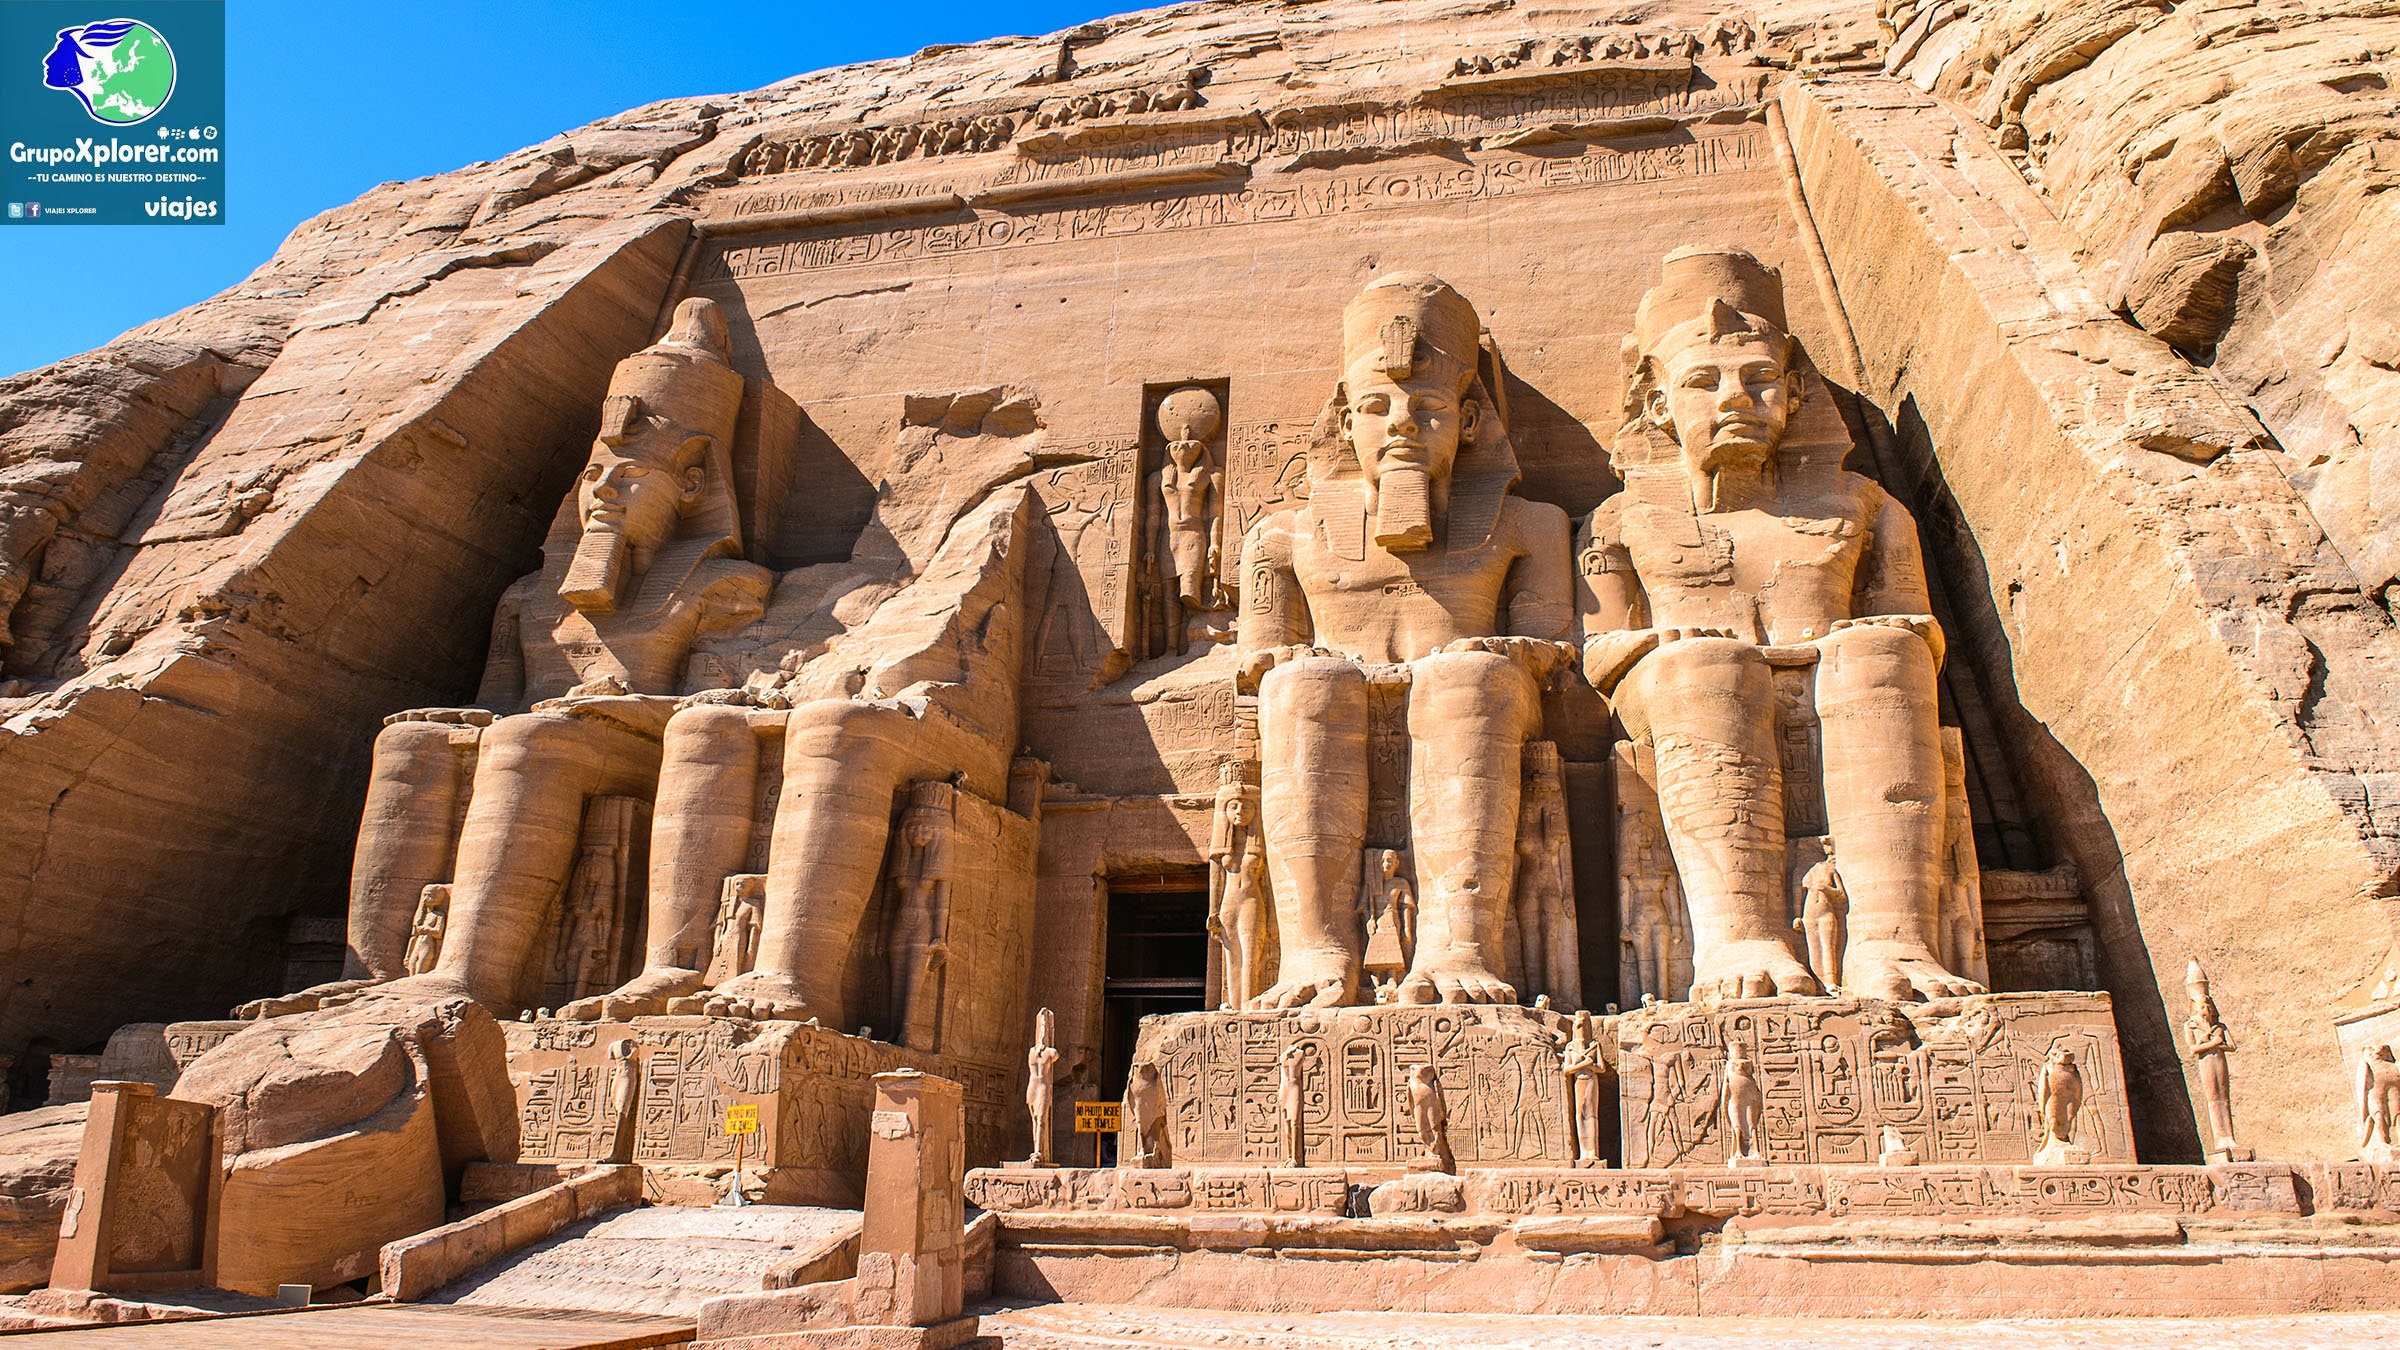 Templo-de-Ramses-II-Abu-Simbel-Egipto